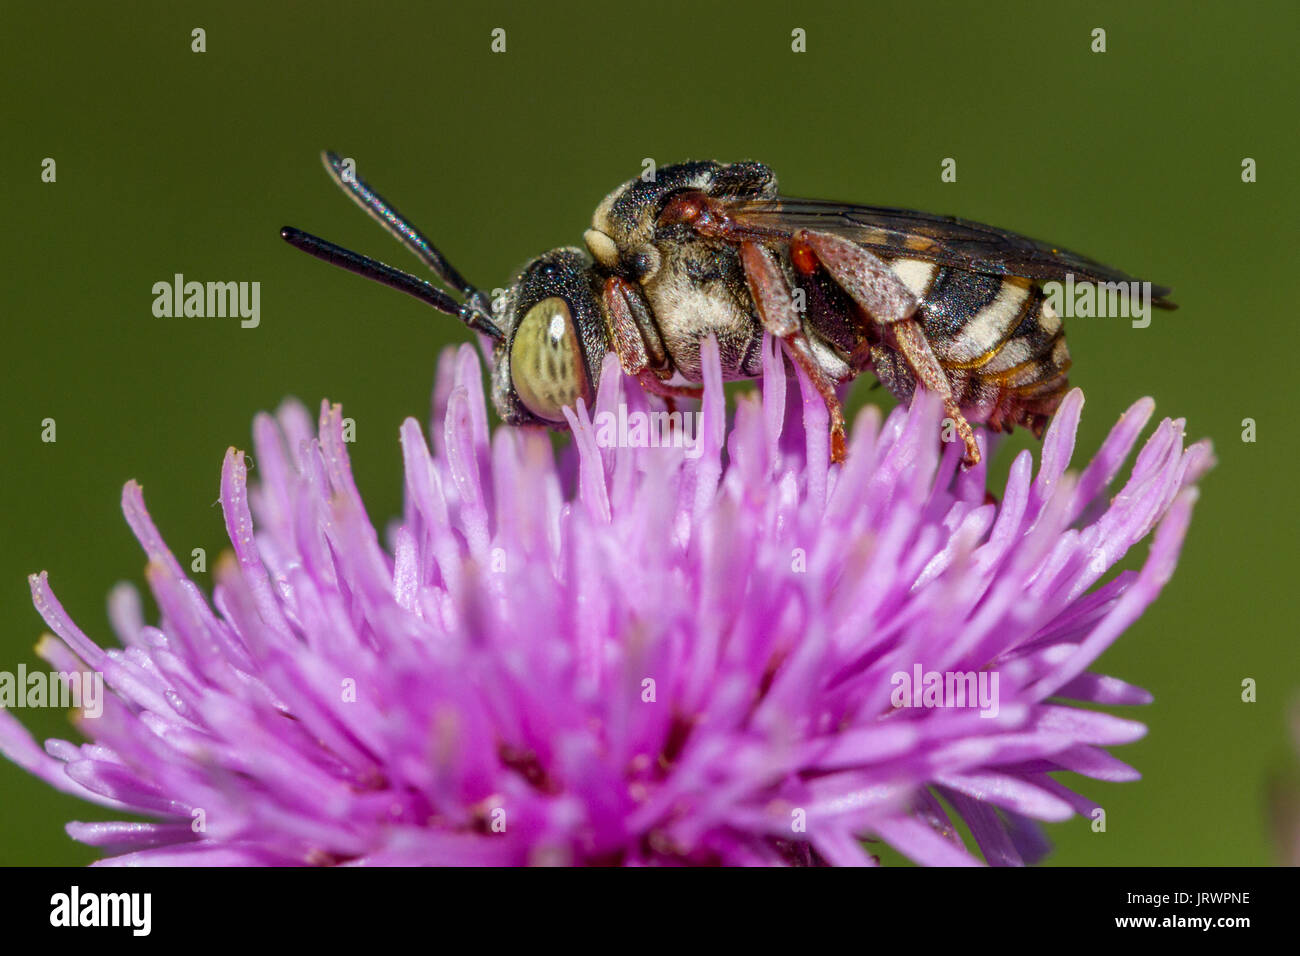 La faune: Epeolus variegatus UK, une belle abeille solitaire qui est cleptoparasitic, Burley, Ilkley Moor, West Yorkshire, Angleterre Photo Stock